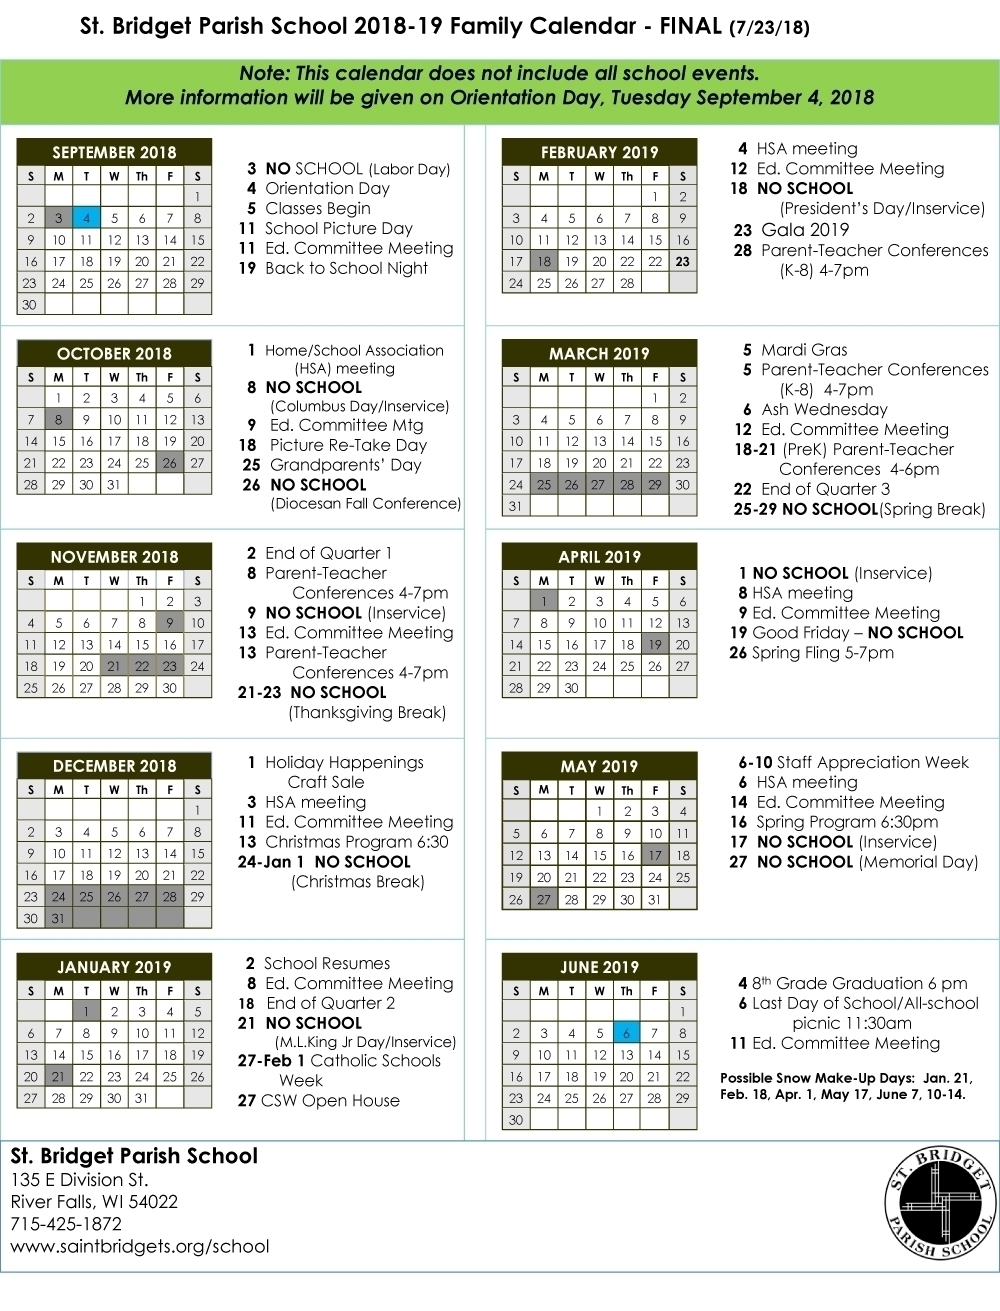 Roman Catholic Liturgical Calendar 2020 Excel Format throughout 2020 Catholic Liturgical Calendar Pdf